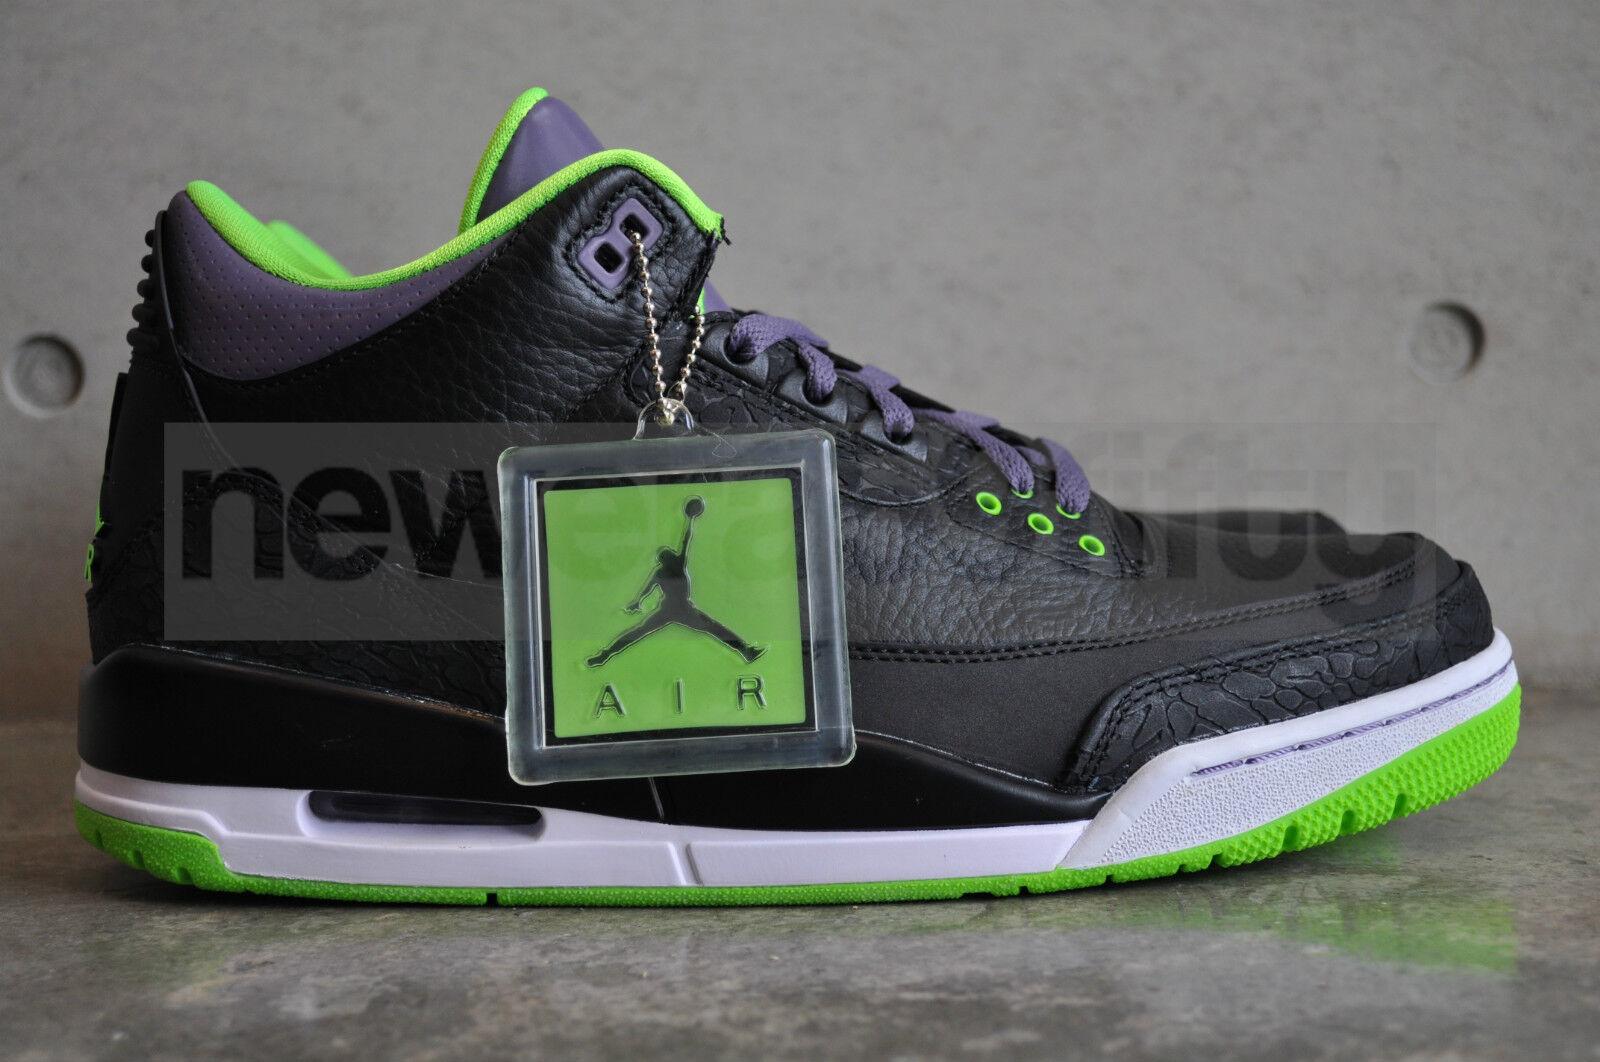 Nike Air Jordan 3 Retro  Joker  - Black Elctrc Grn-Cnyn Prpl-Wht